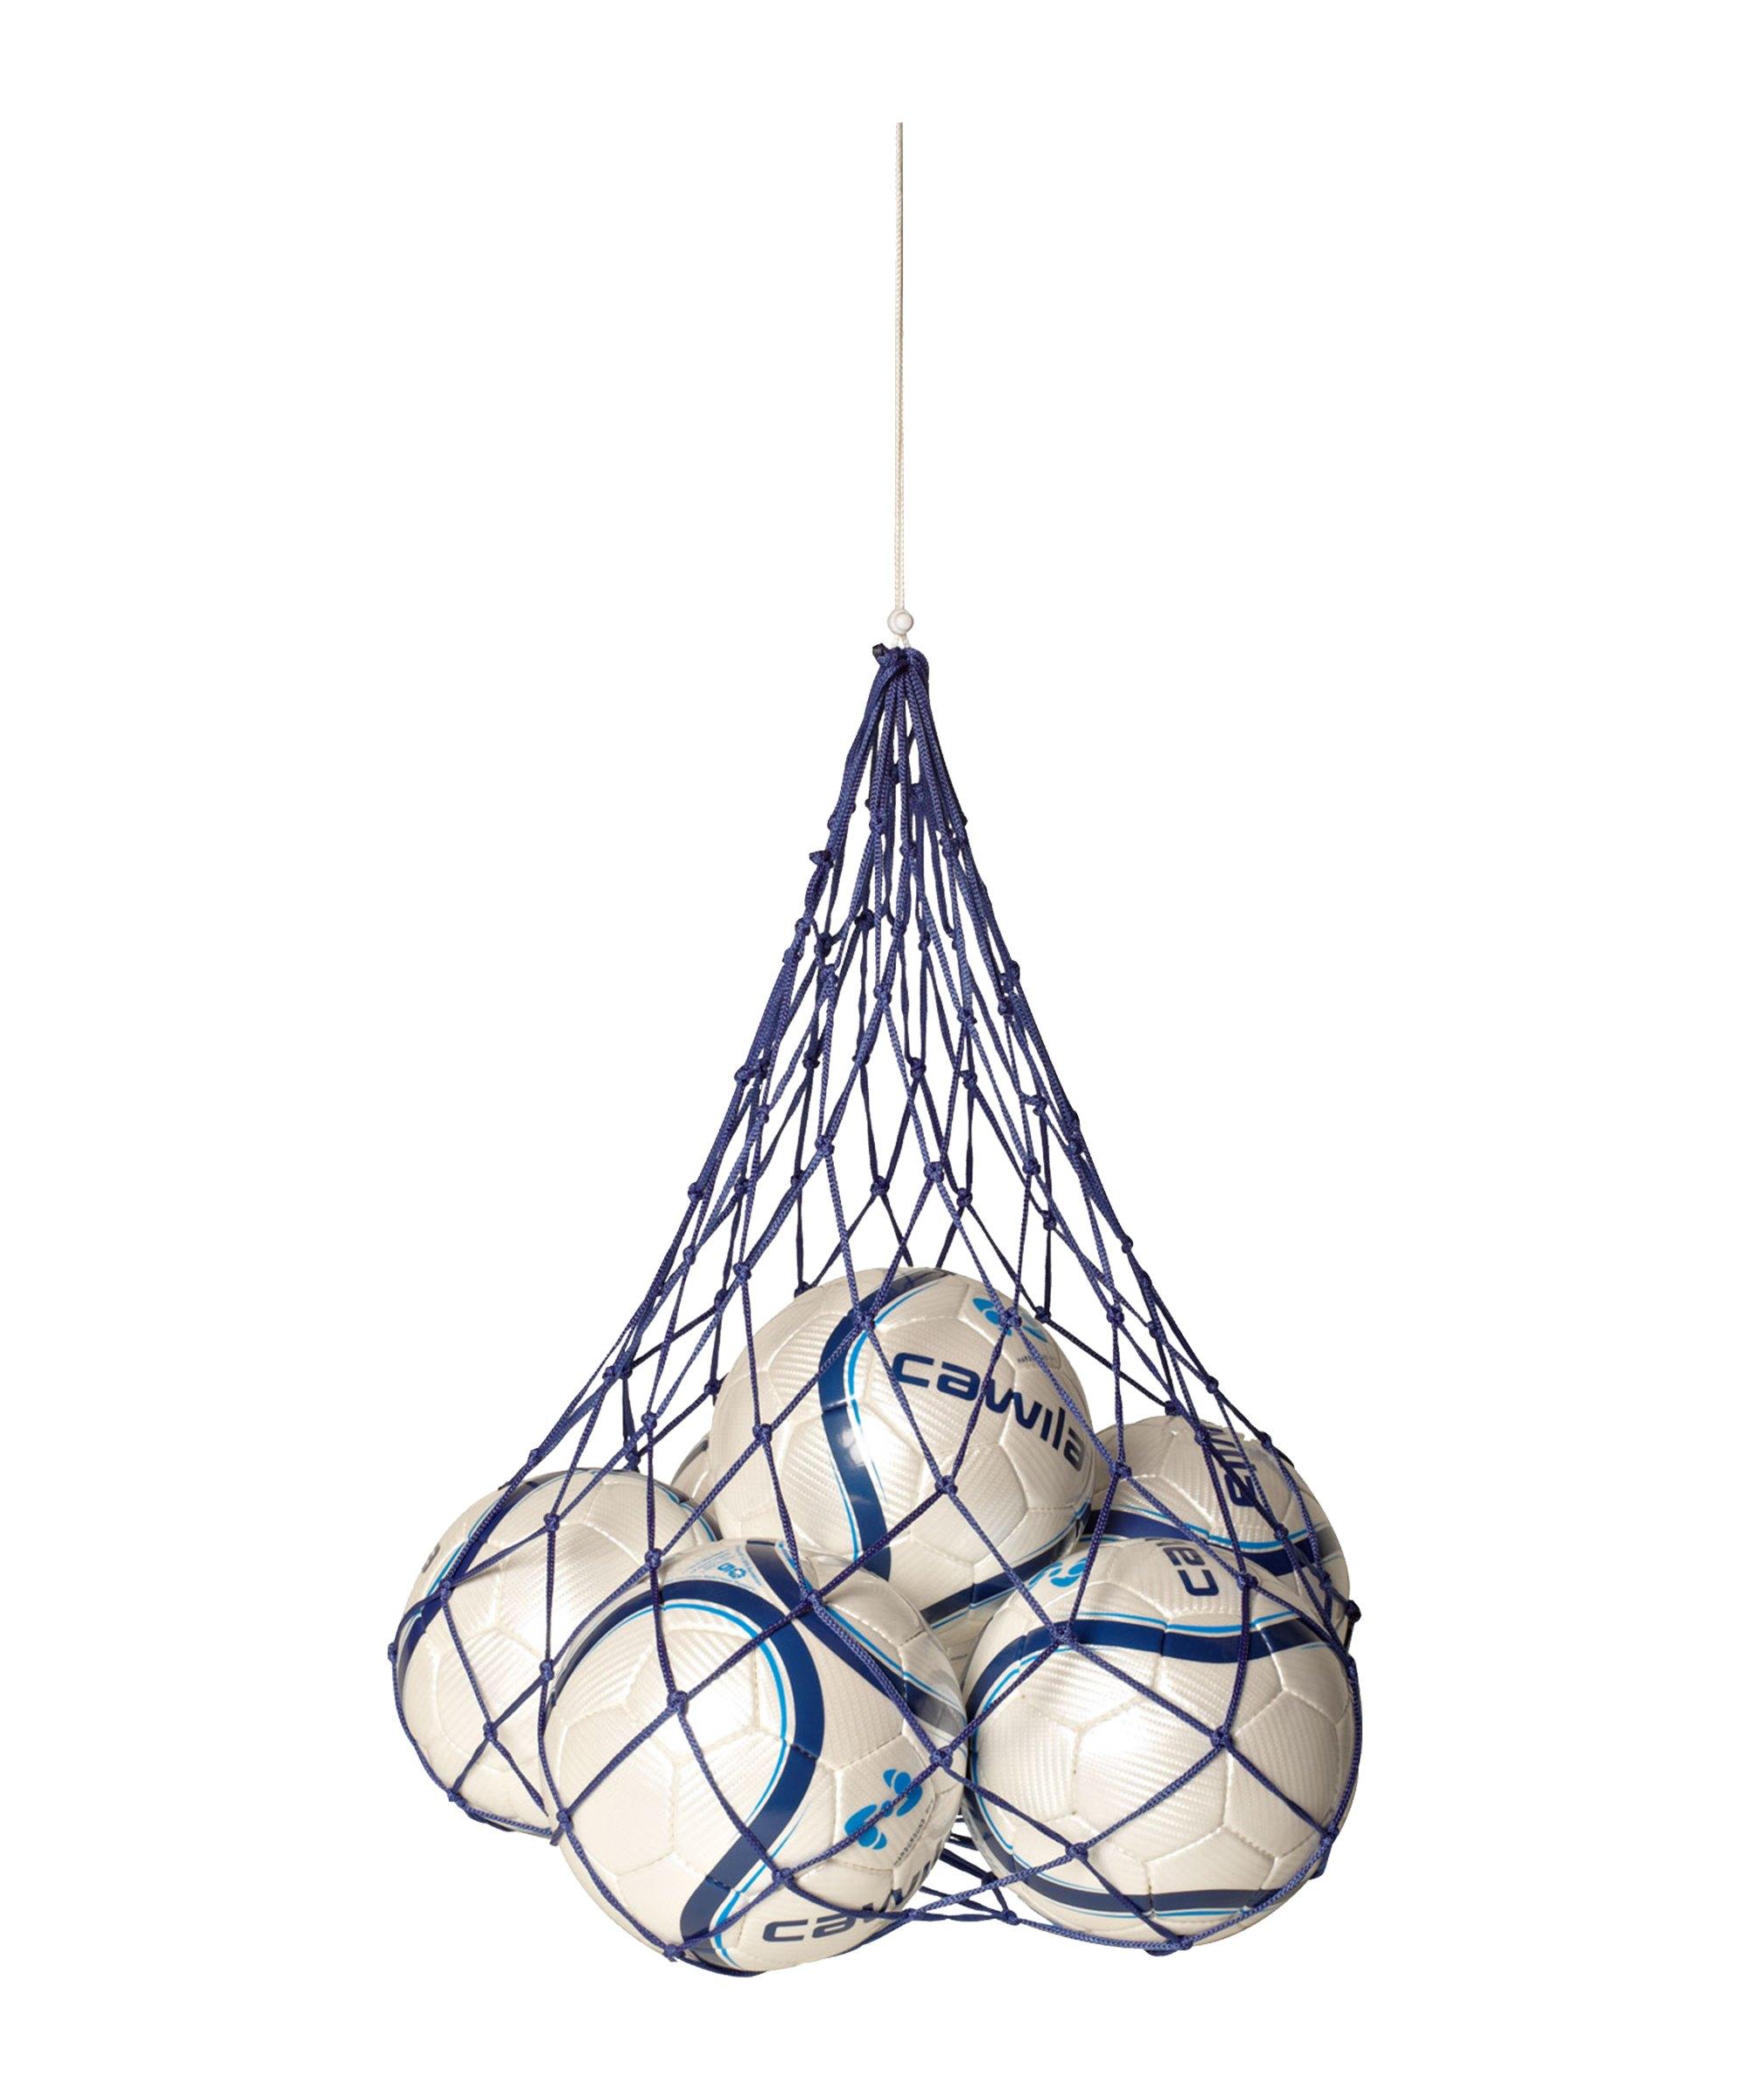 Cawila Nylon-Ballnetz 10 Fussbälle Blau - blau